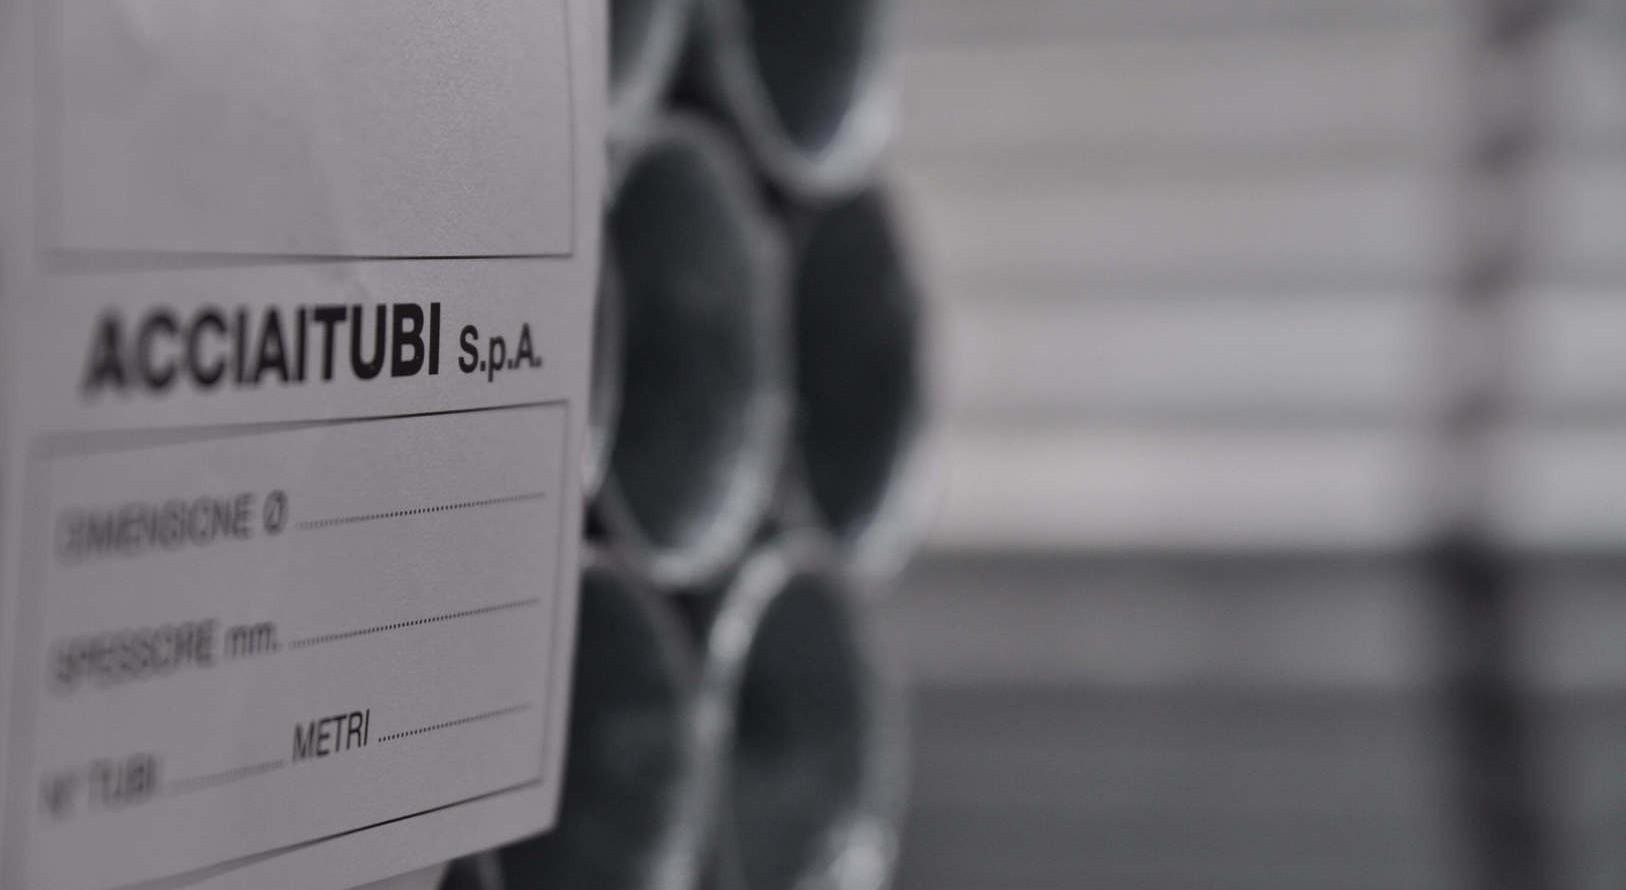 Zertifizierung der Stahlrohre bei Acciaitubi